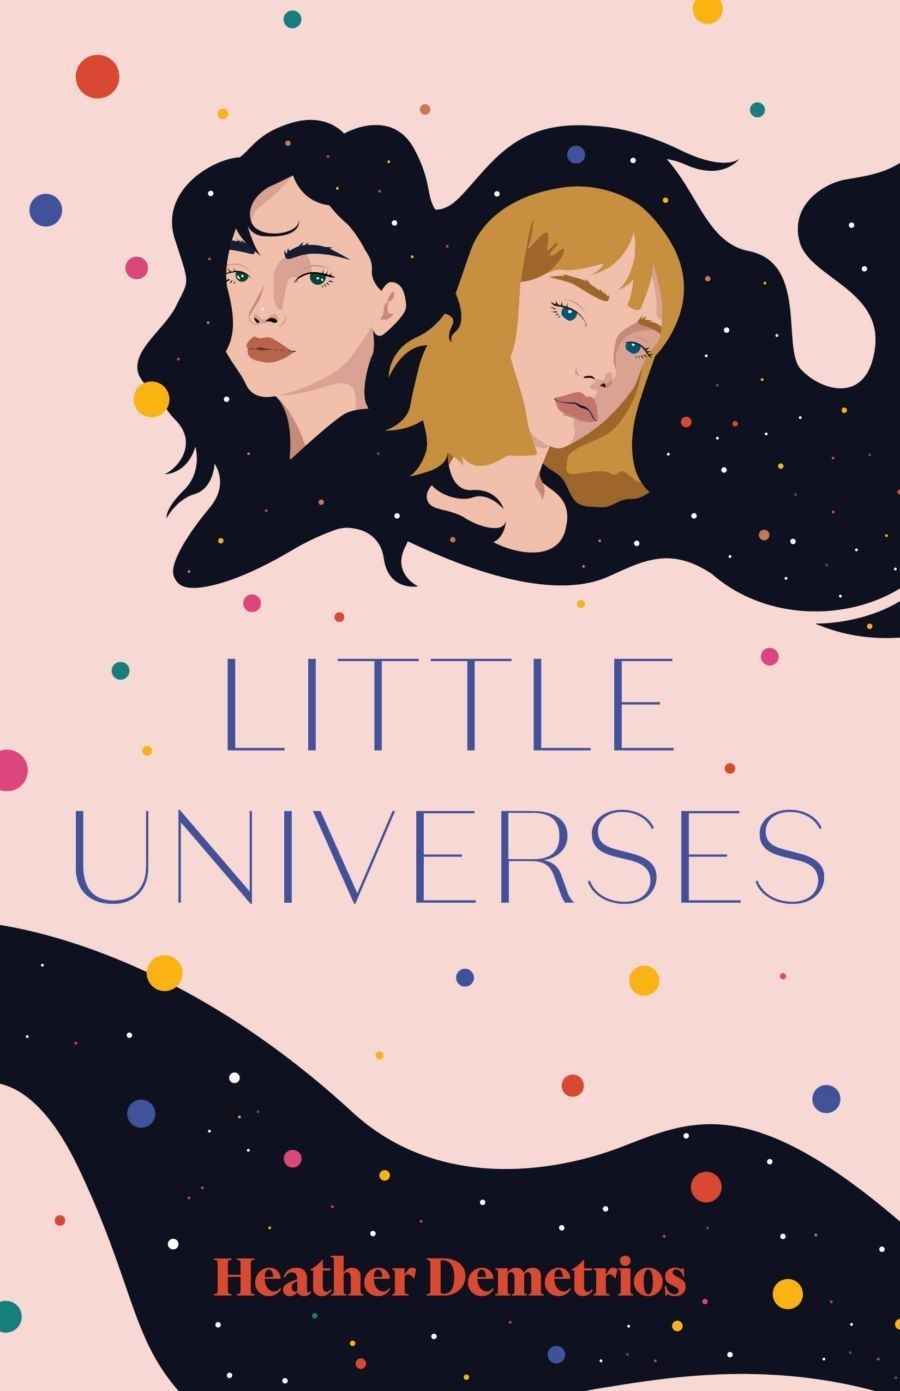 Little Universes - Heather Demetrios